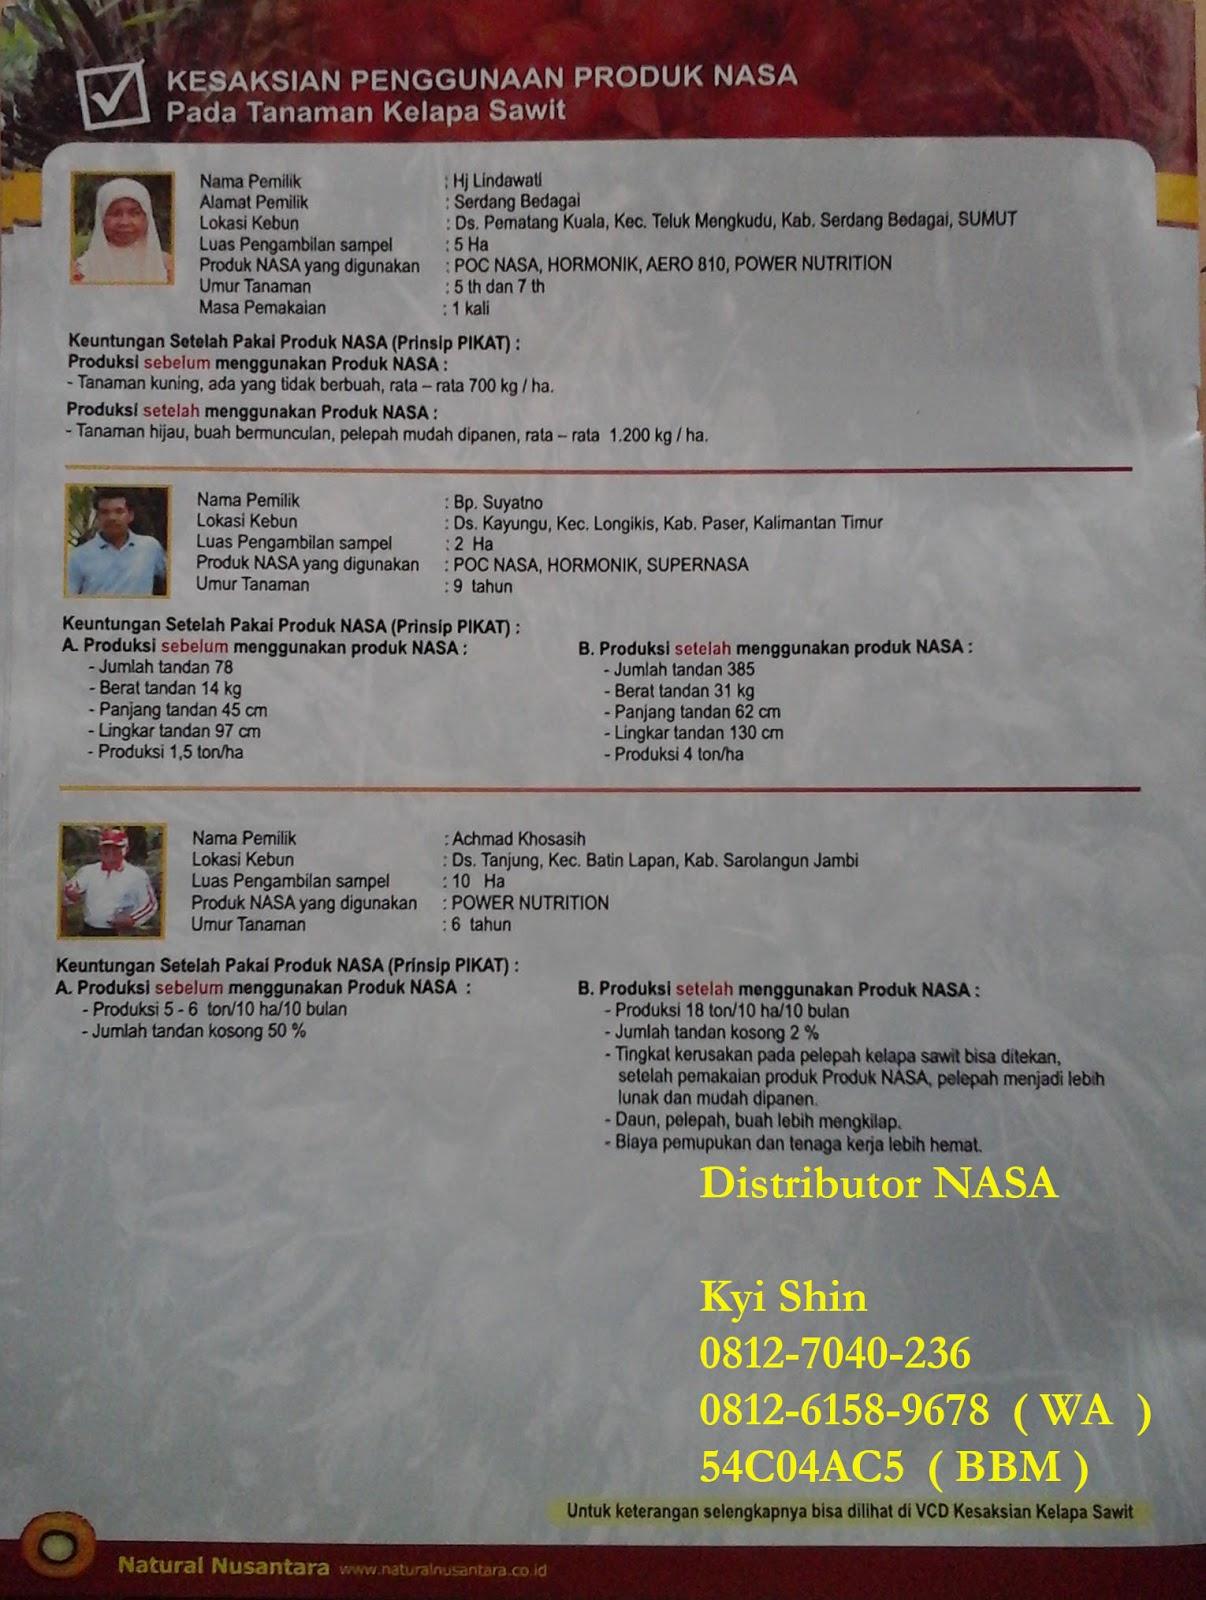 Jual Pupuk Kelapa Sawit Di Jakarta d3fcff8bfb